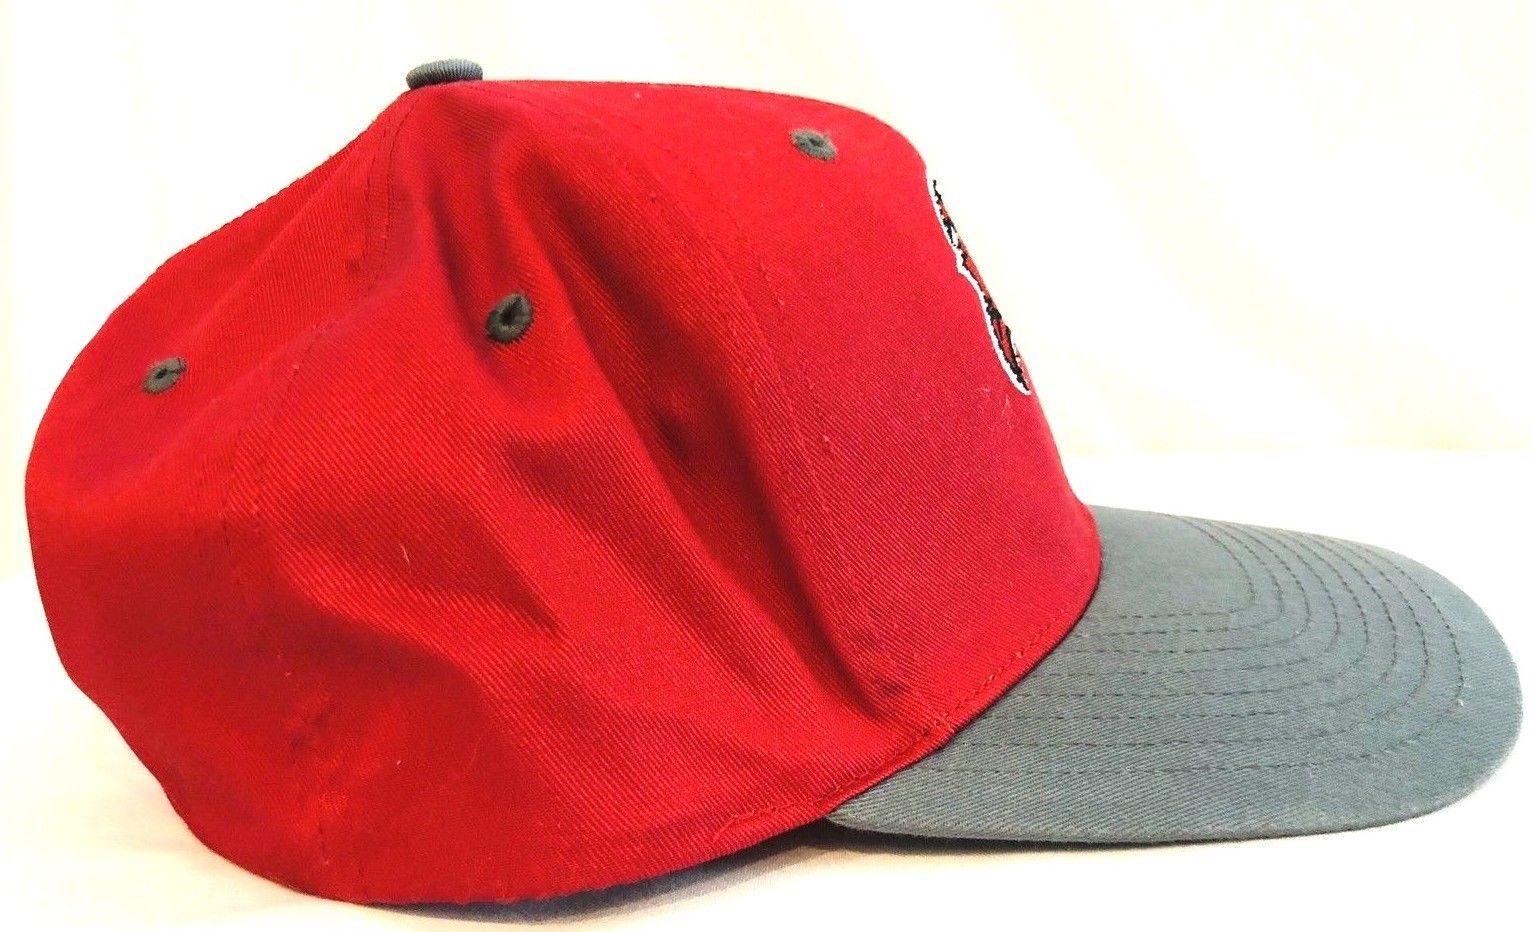 timeless design 5d5df 103b3 ... Tampa Bay Buccaneers Hat Logo 7 Cap Snapback NFL Football Baseball Red  Light Up ...